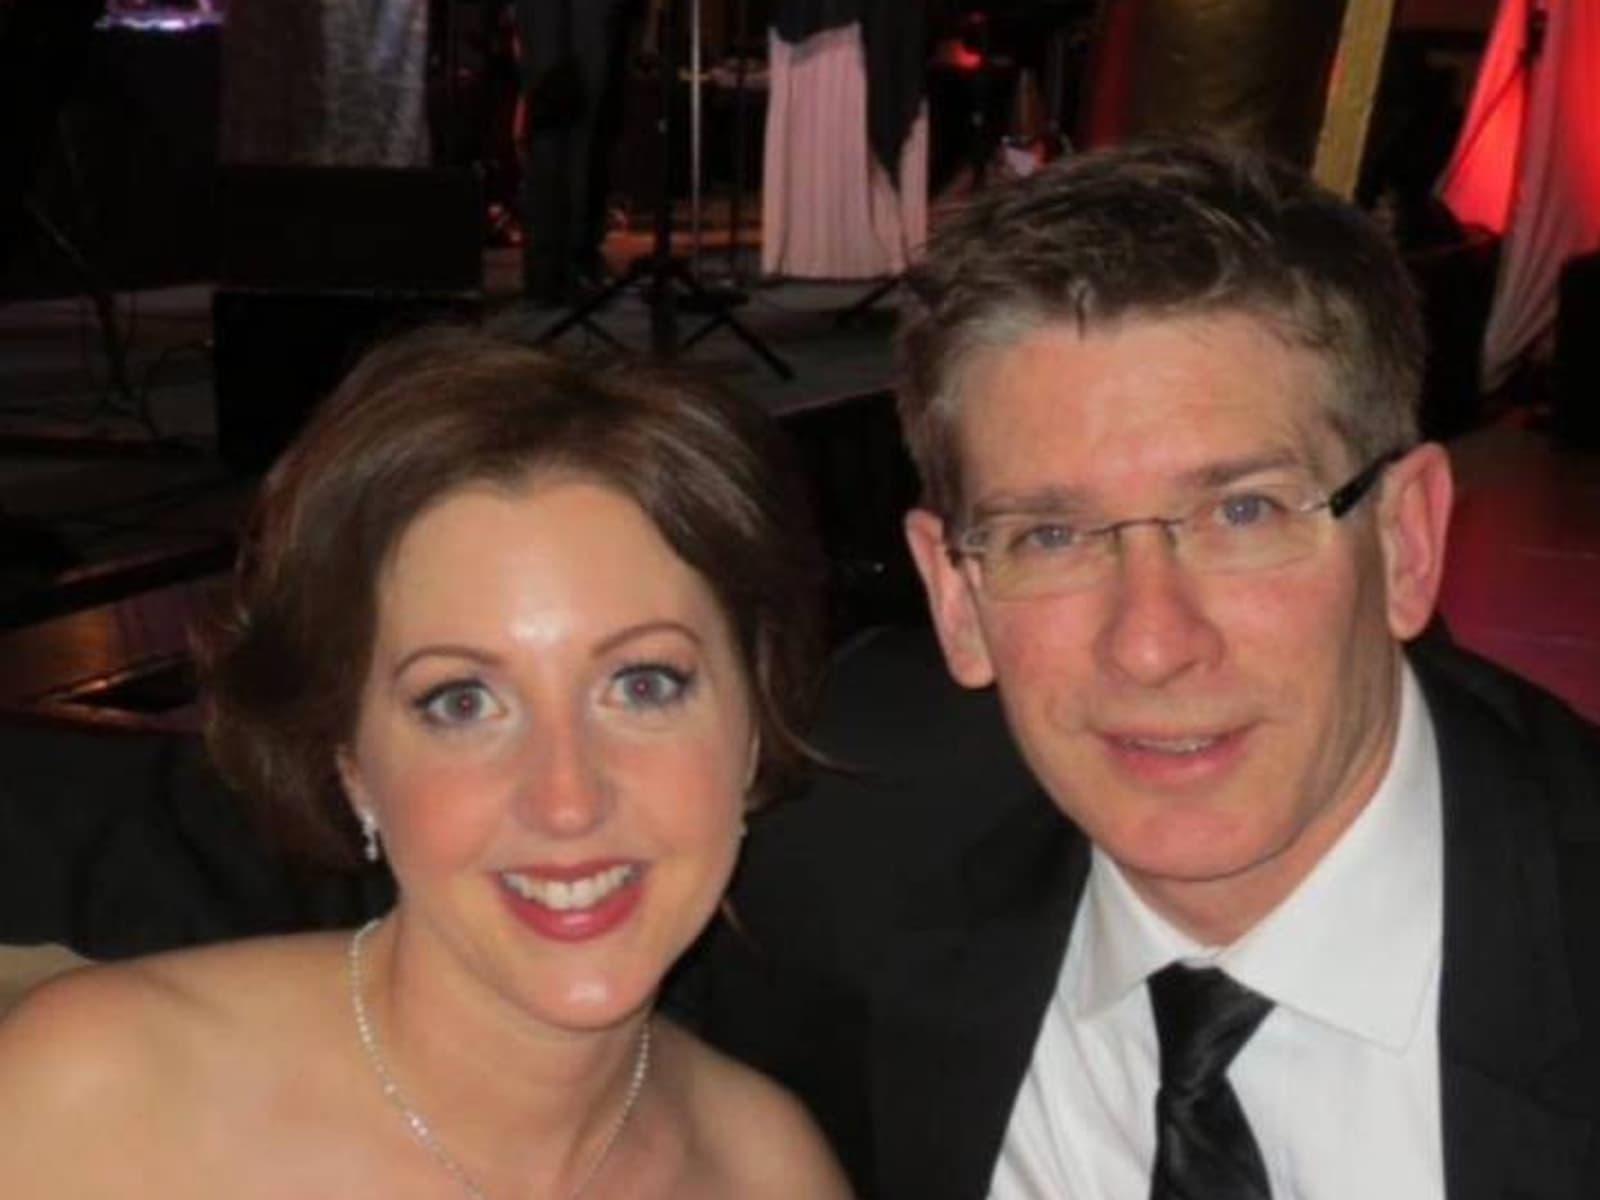 Beth & James from Ottawa, Ontario, Canada